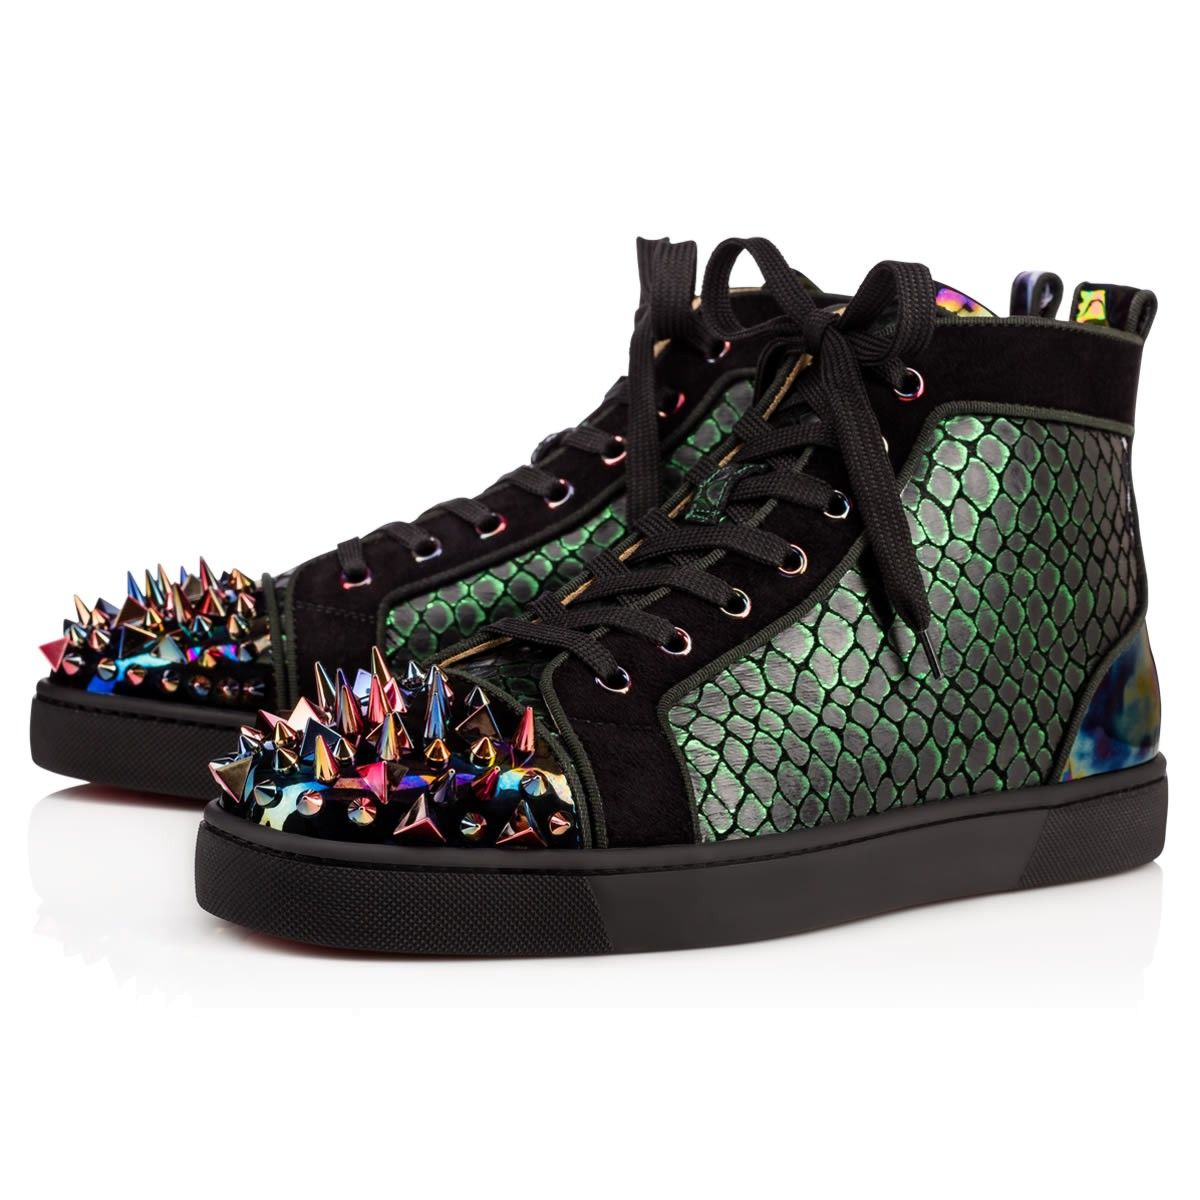 buy online ec8ae 2620e CHRISTIAN LOUBOUTIN Lou Pik Pik Orlato Patent Stellar Multicolor Canvas -  Men Shoes - Christian Louboutin. christianlouboutin shoes